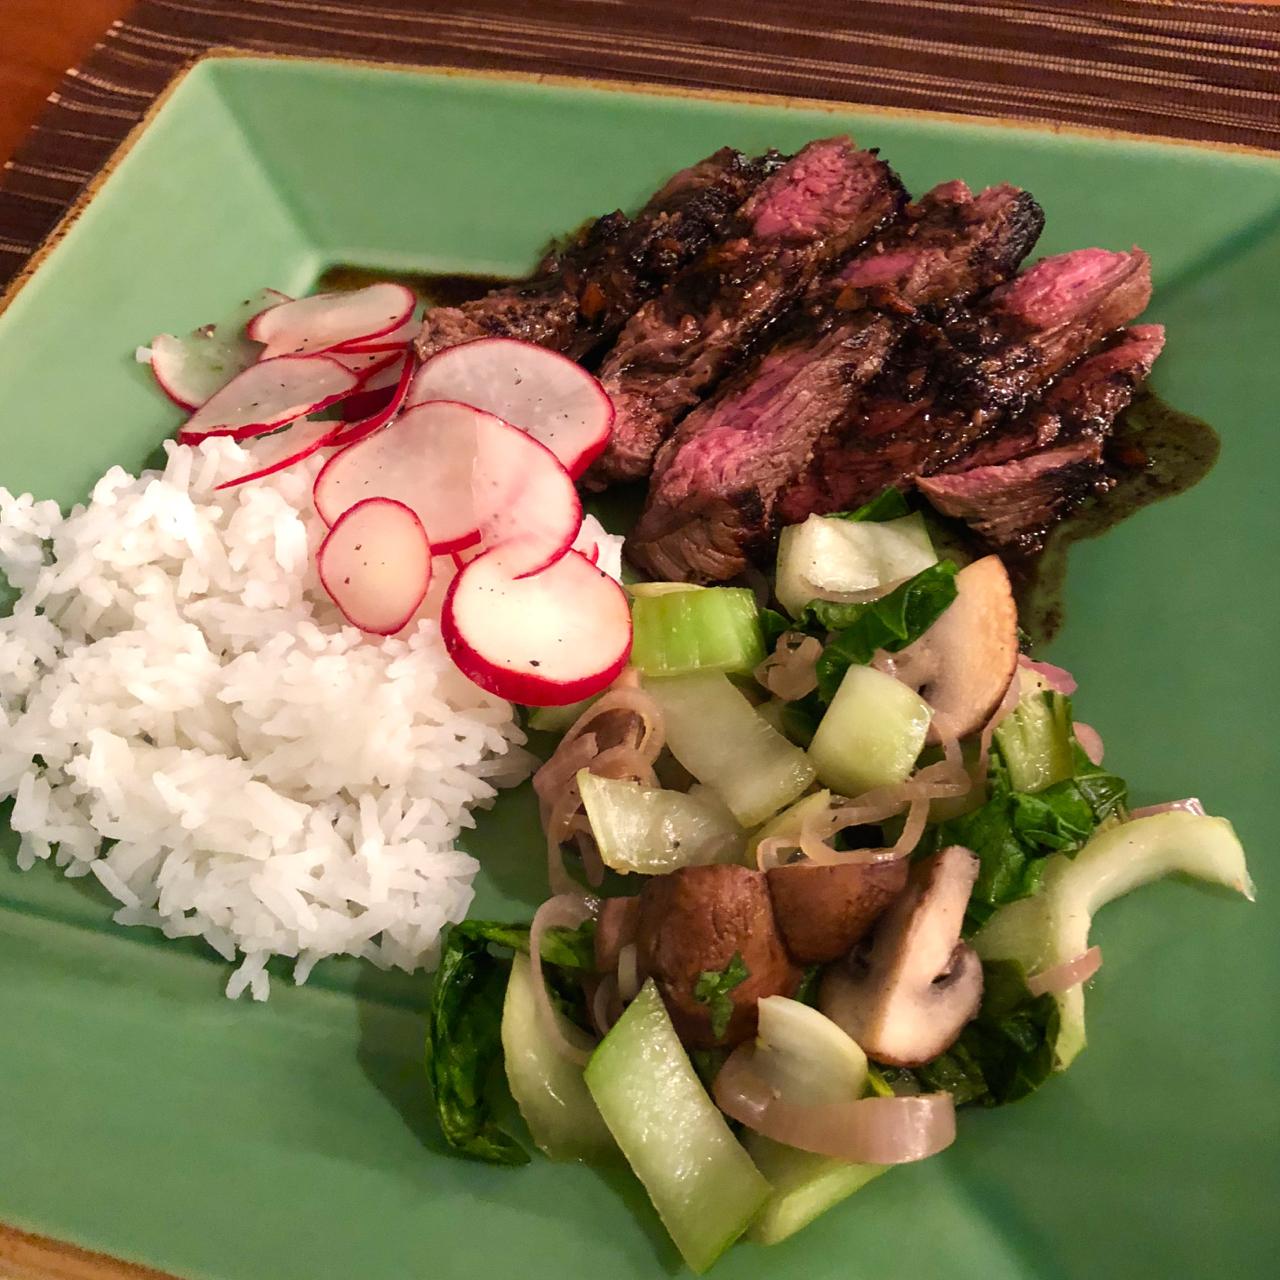 jo-torrijos-states-of-reverie-blue-apron-top-chef-strip-steak-sweet-chili-glazed-vegetables-2.jpg